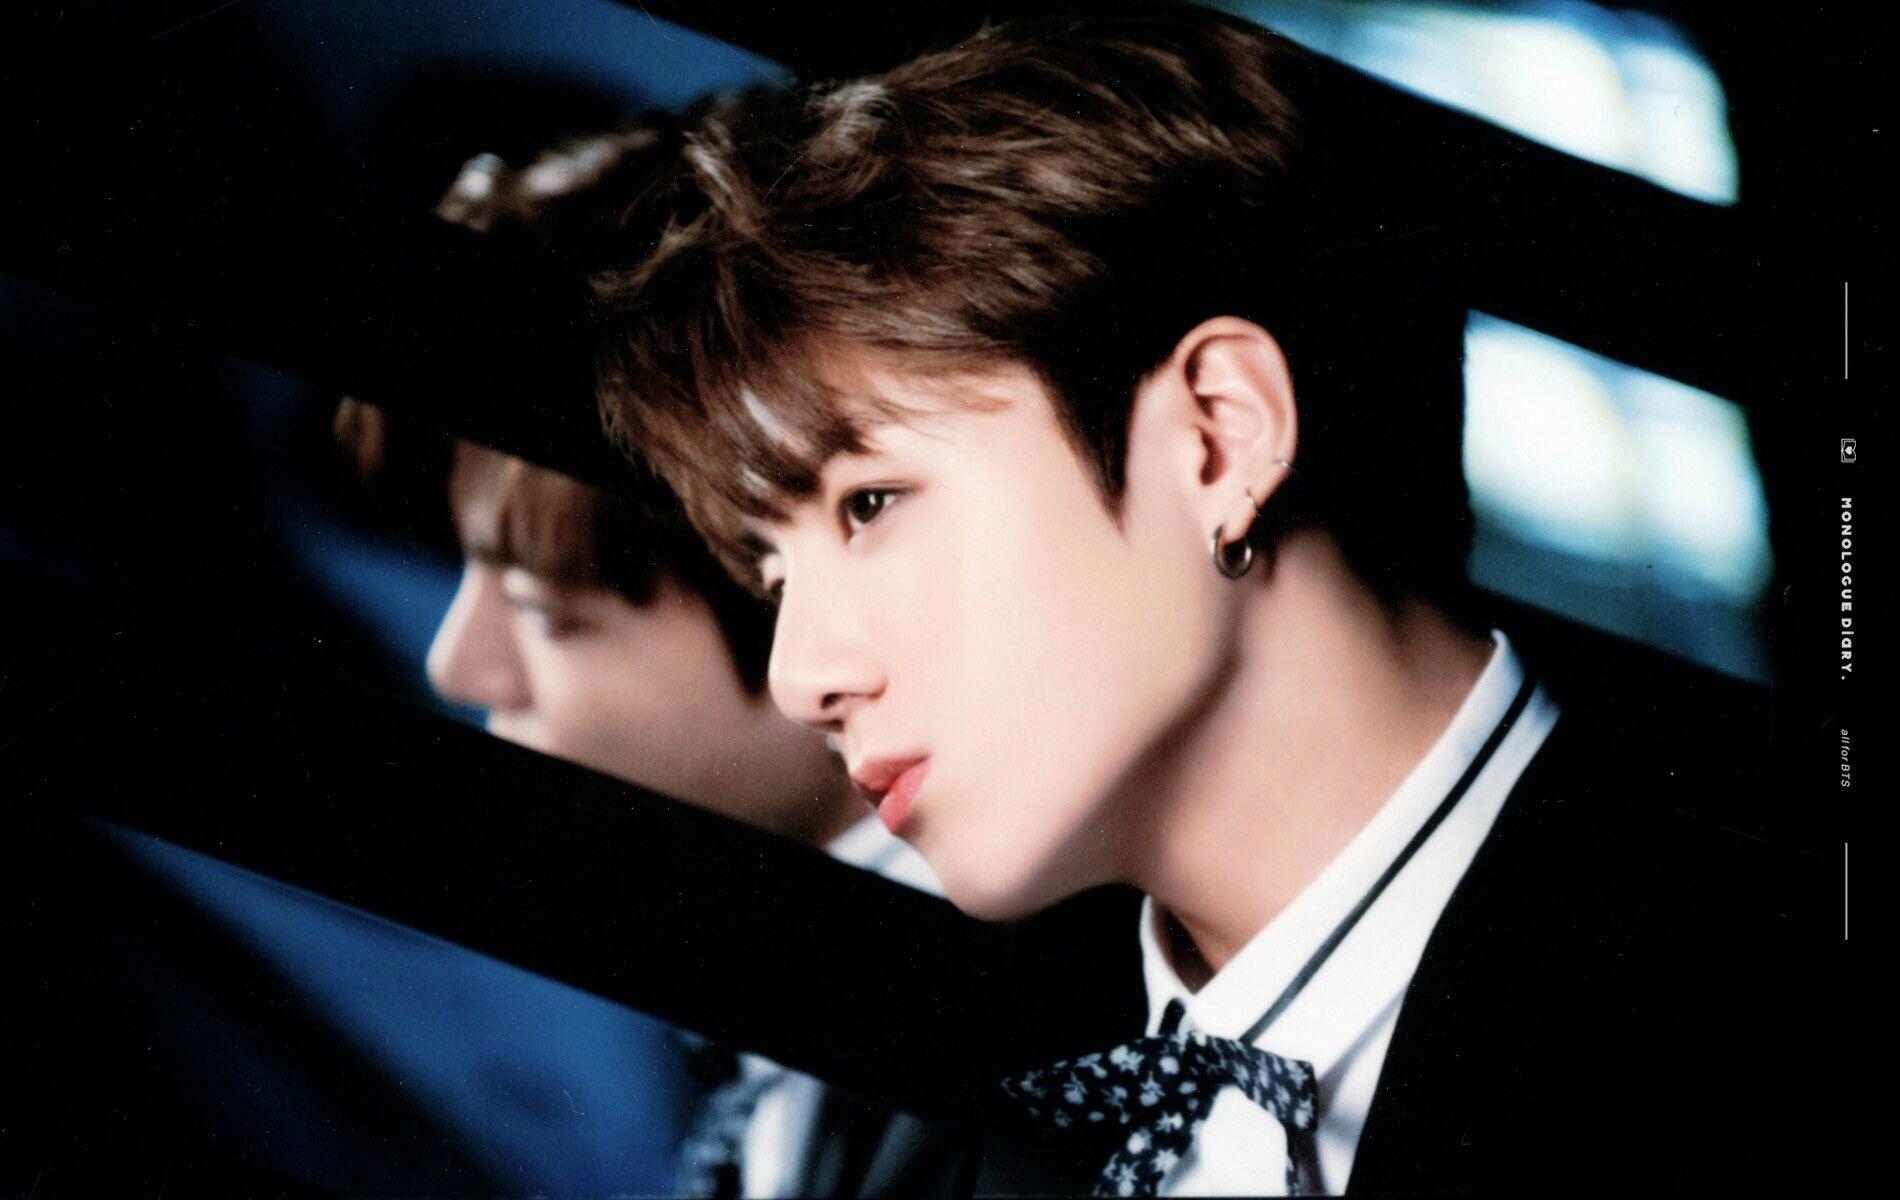 Jungkook ❤ 'Best of BTS' Album Photos #BTS #방탄소년단